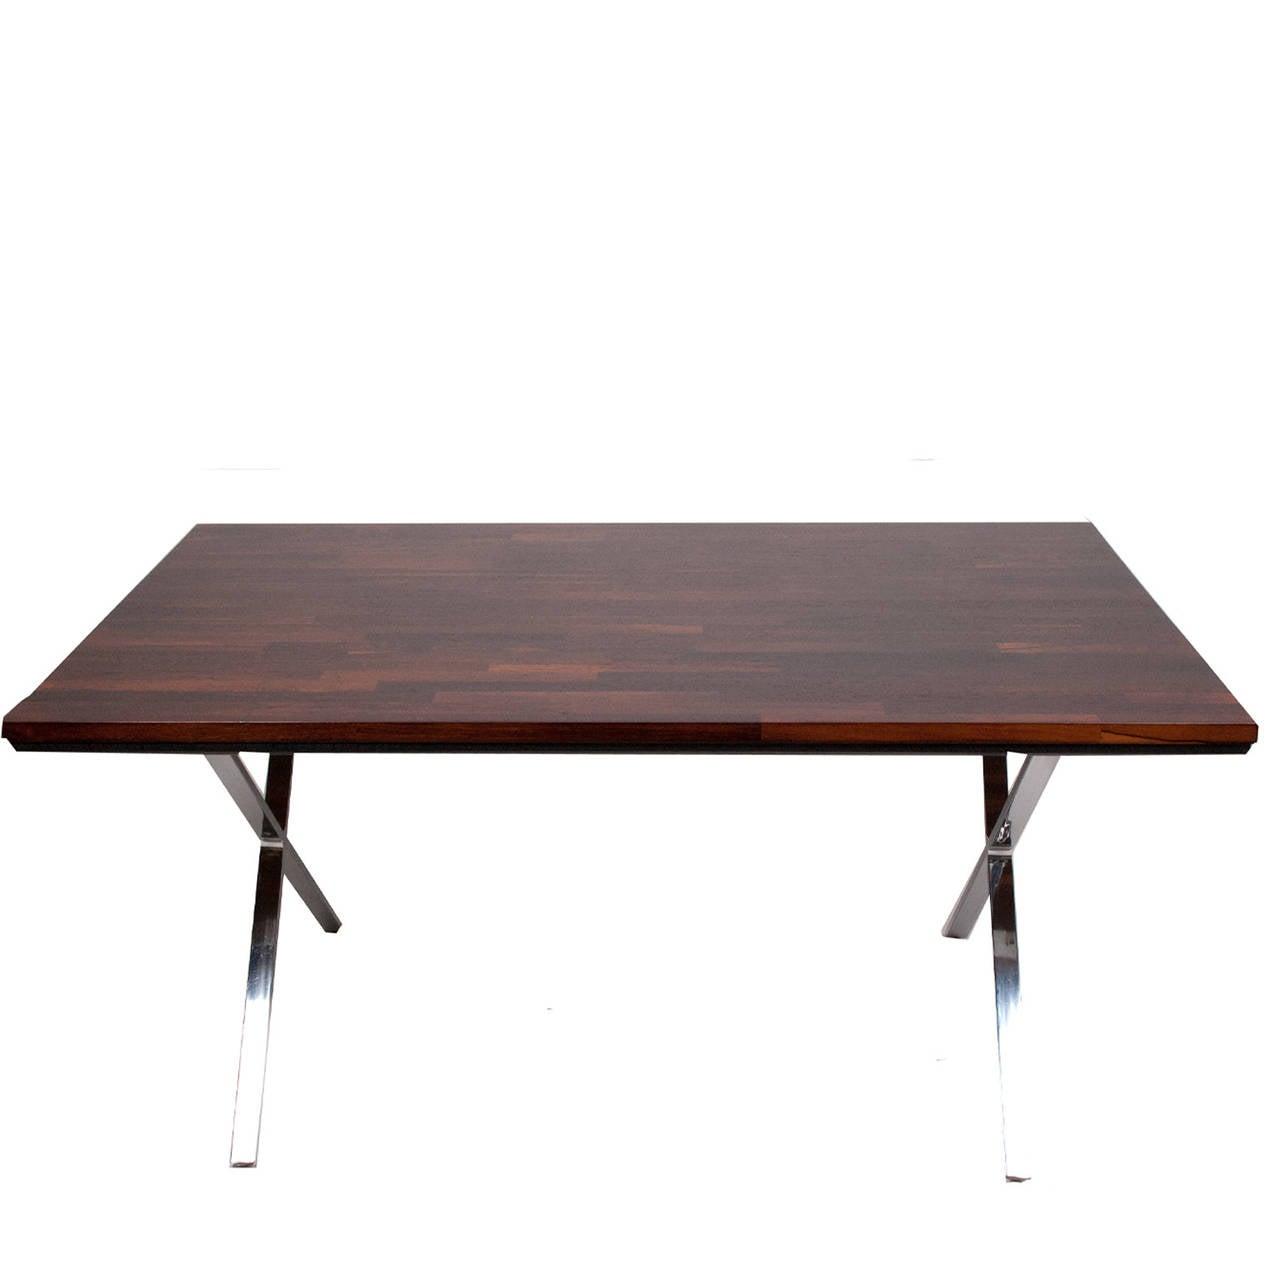 Decorative Metal Gate Hardware ... Gate Leg Table moreover Mid Century Modern Furniture Legs. on table